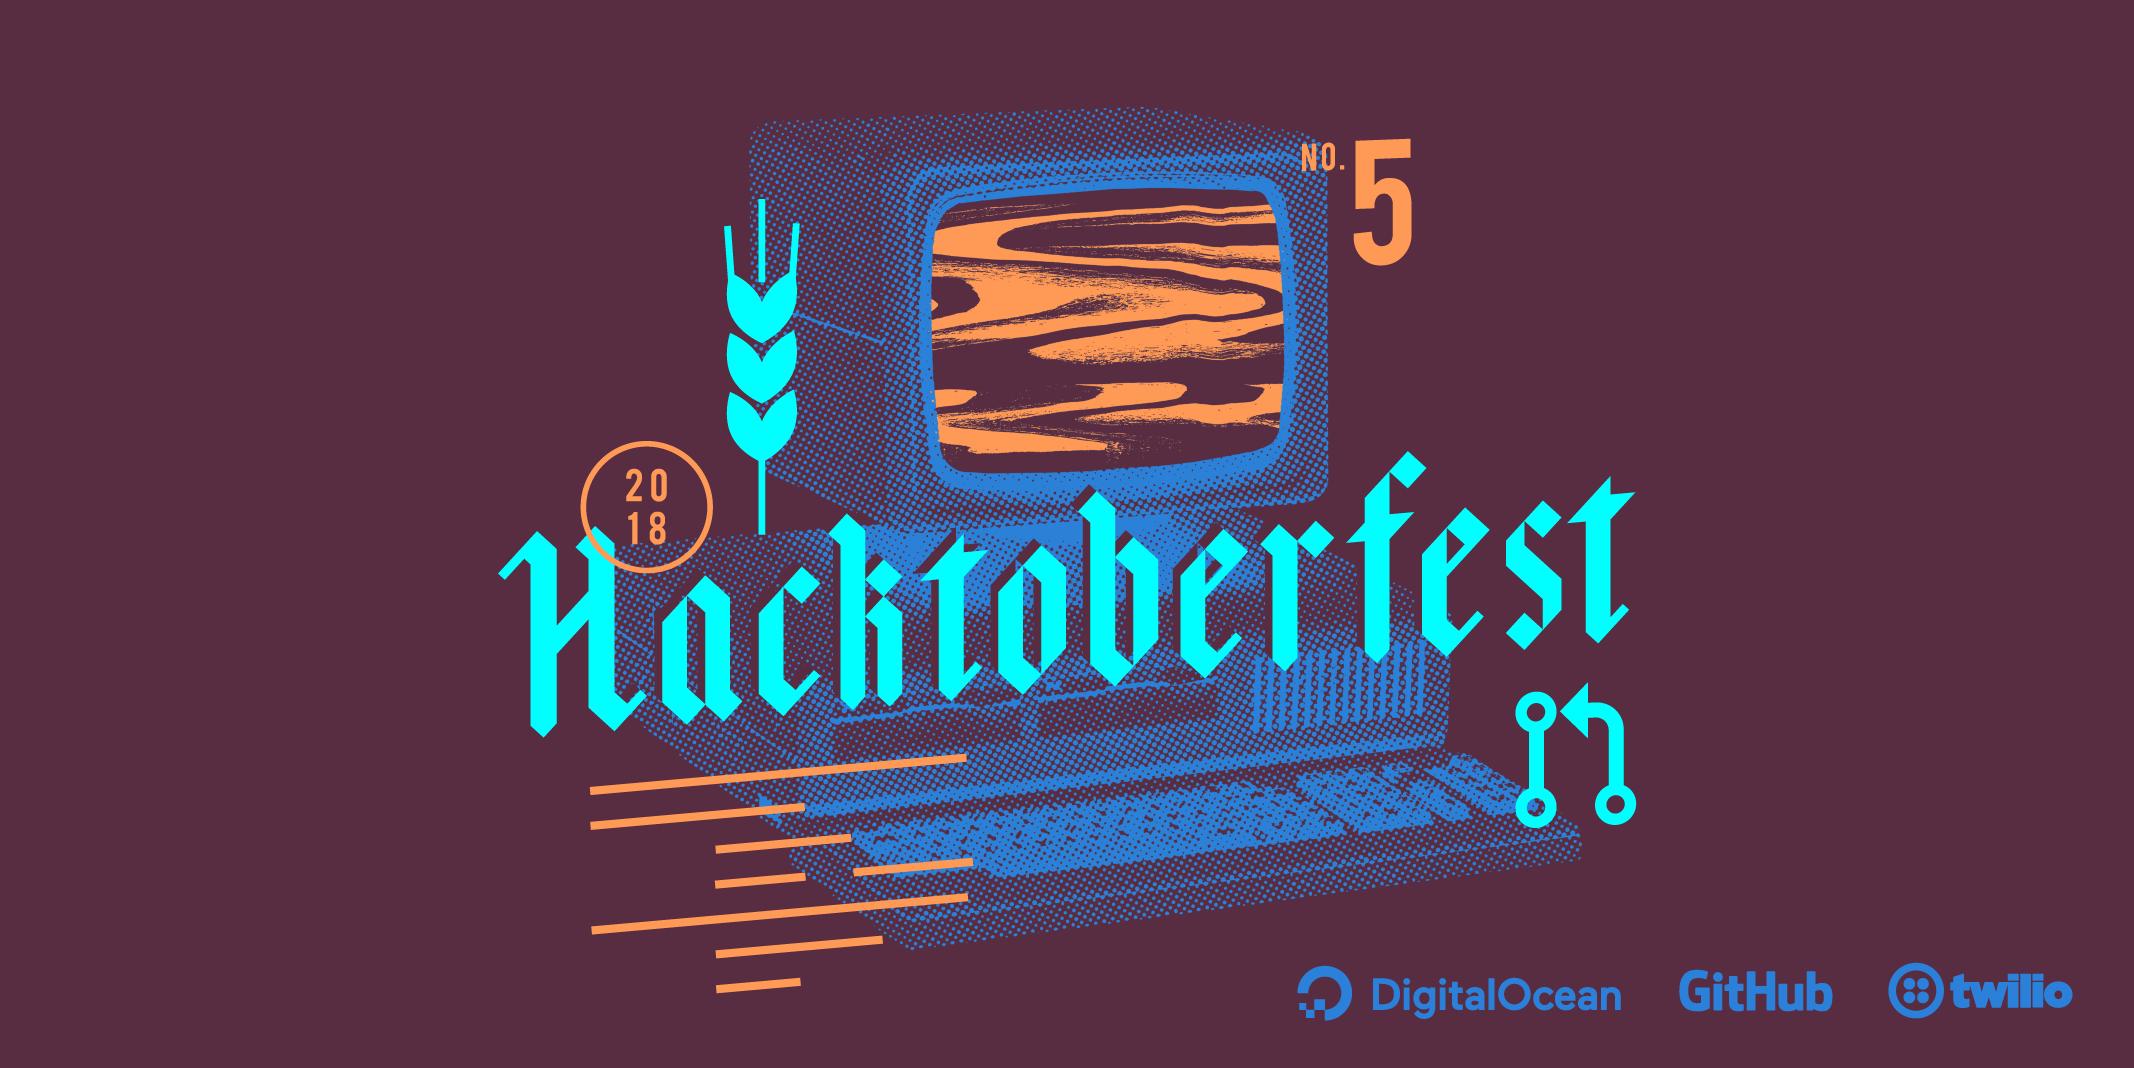 Hacktoberfest is Again for Yr 5 - Internet & Technology News